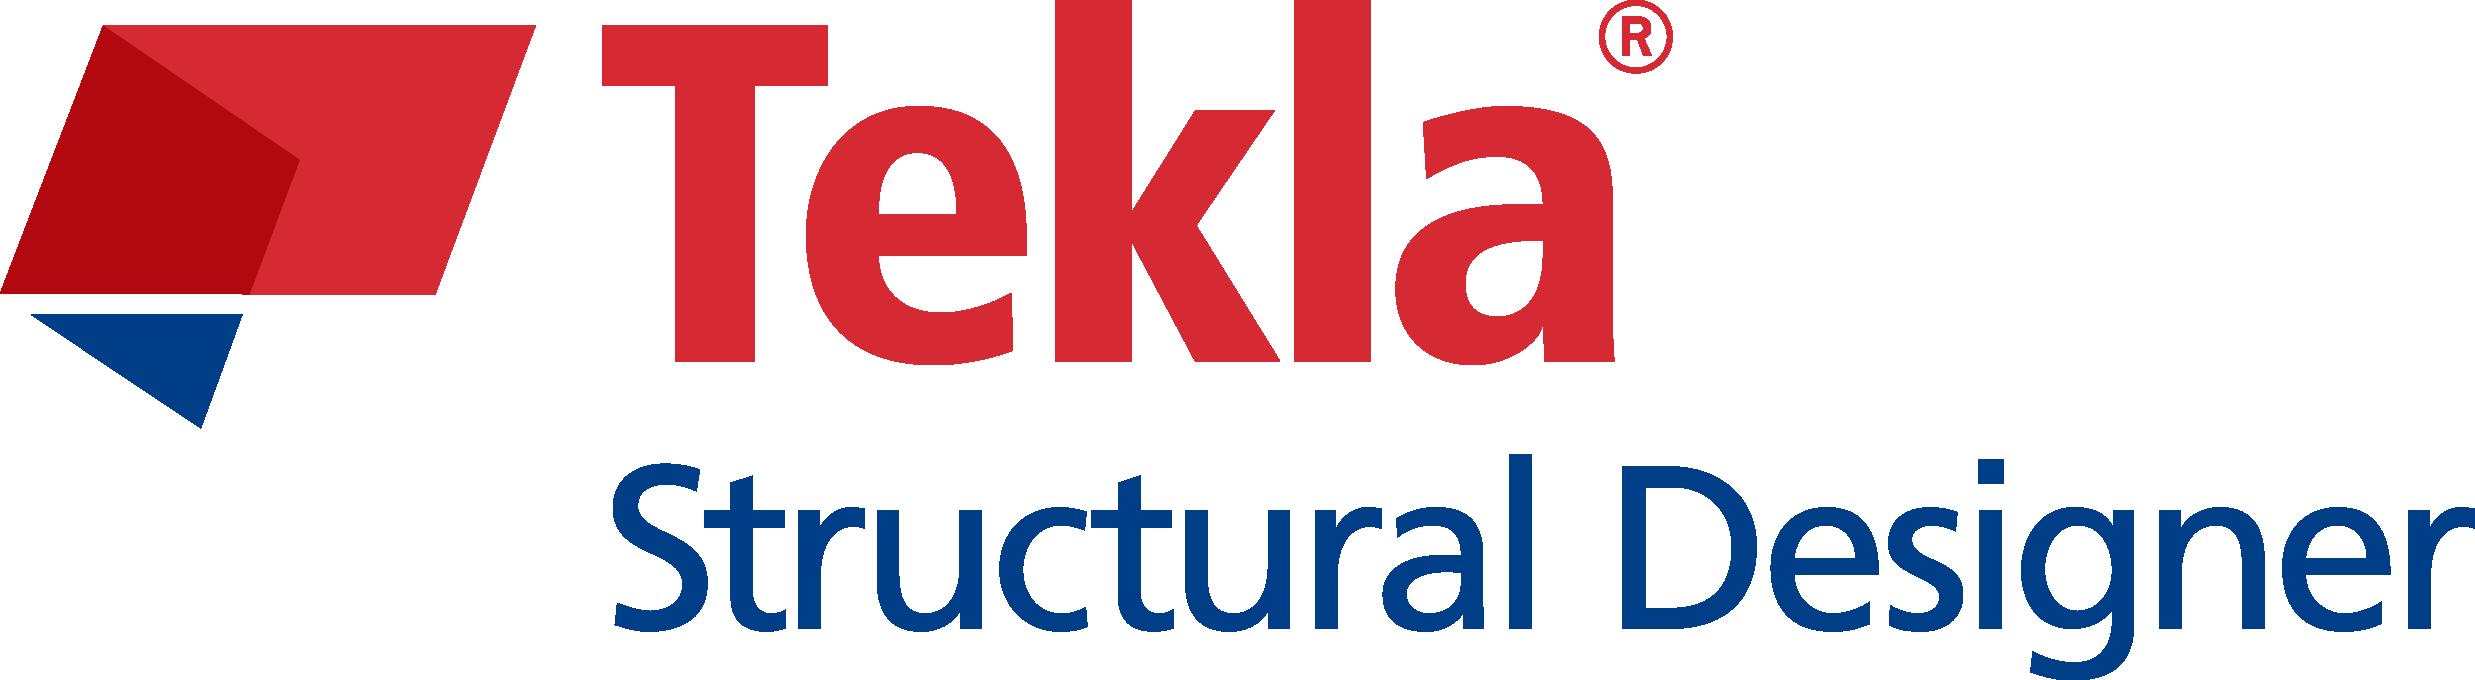 tekla2016-structural-designer-pos-rgb.png